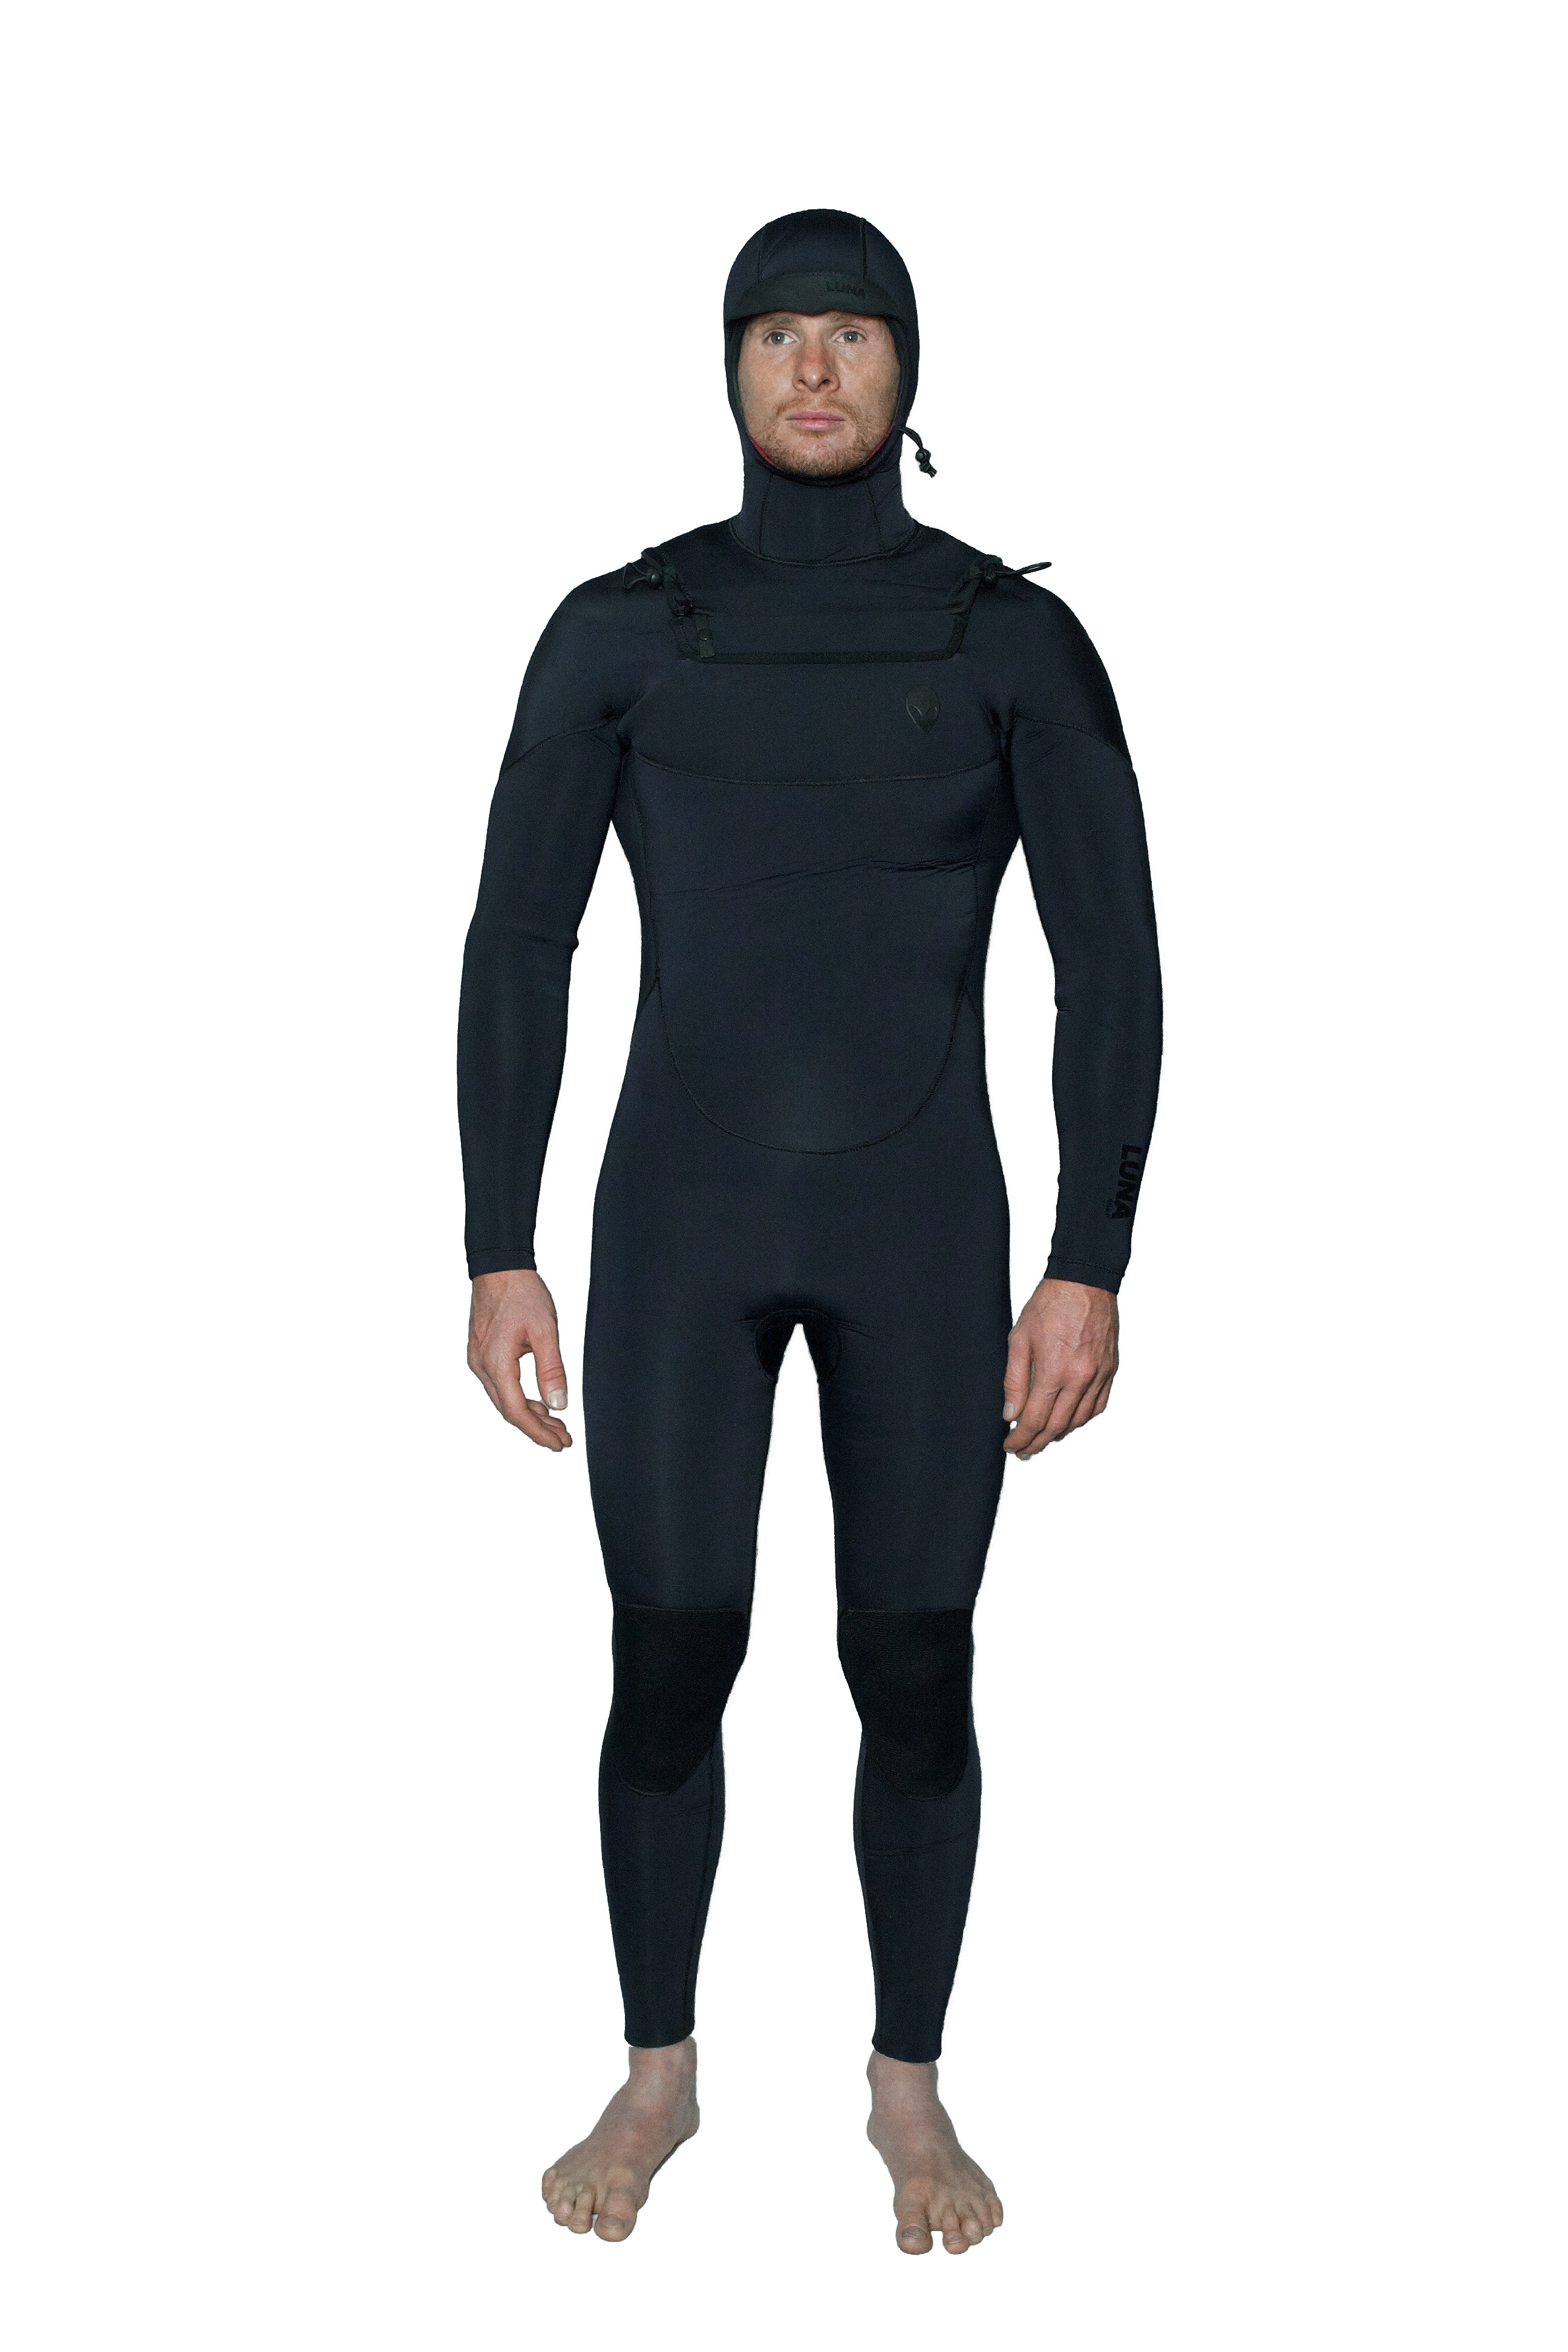 black winter wetsuit